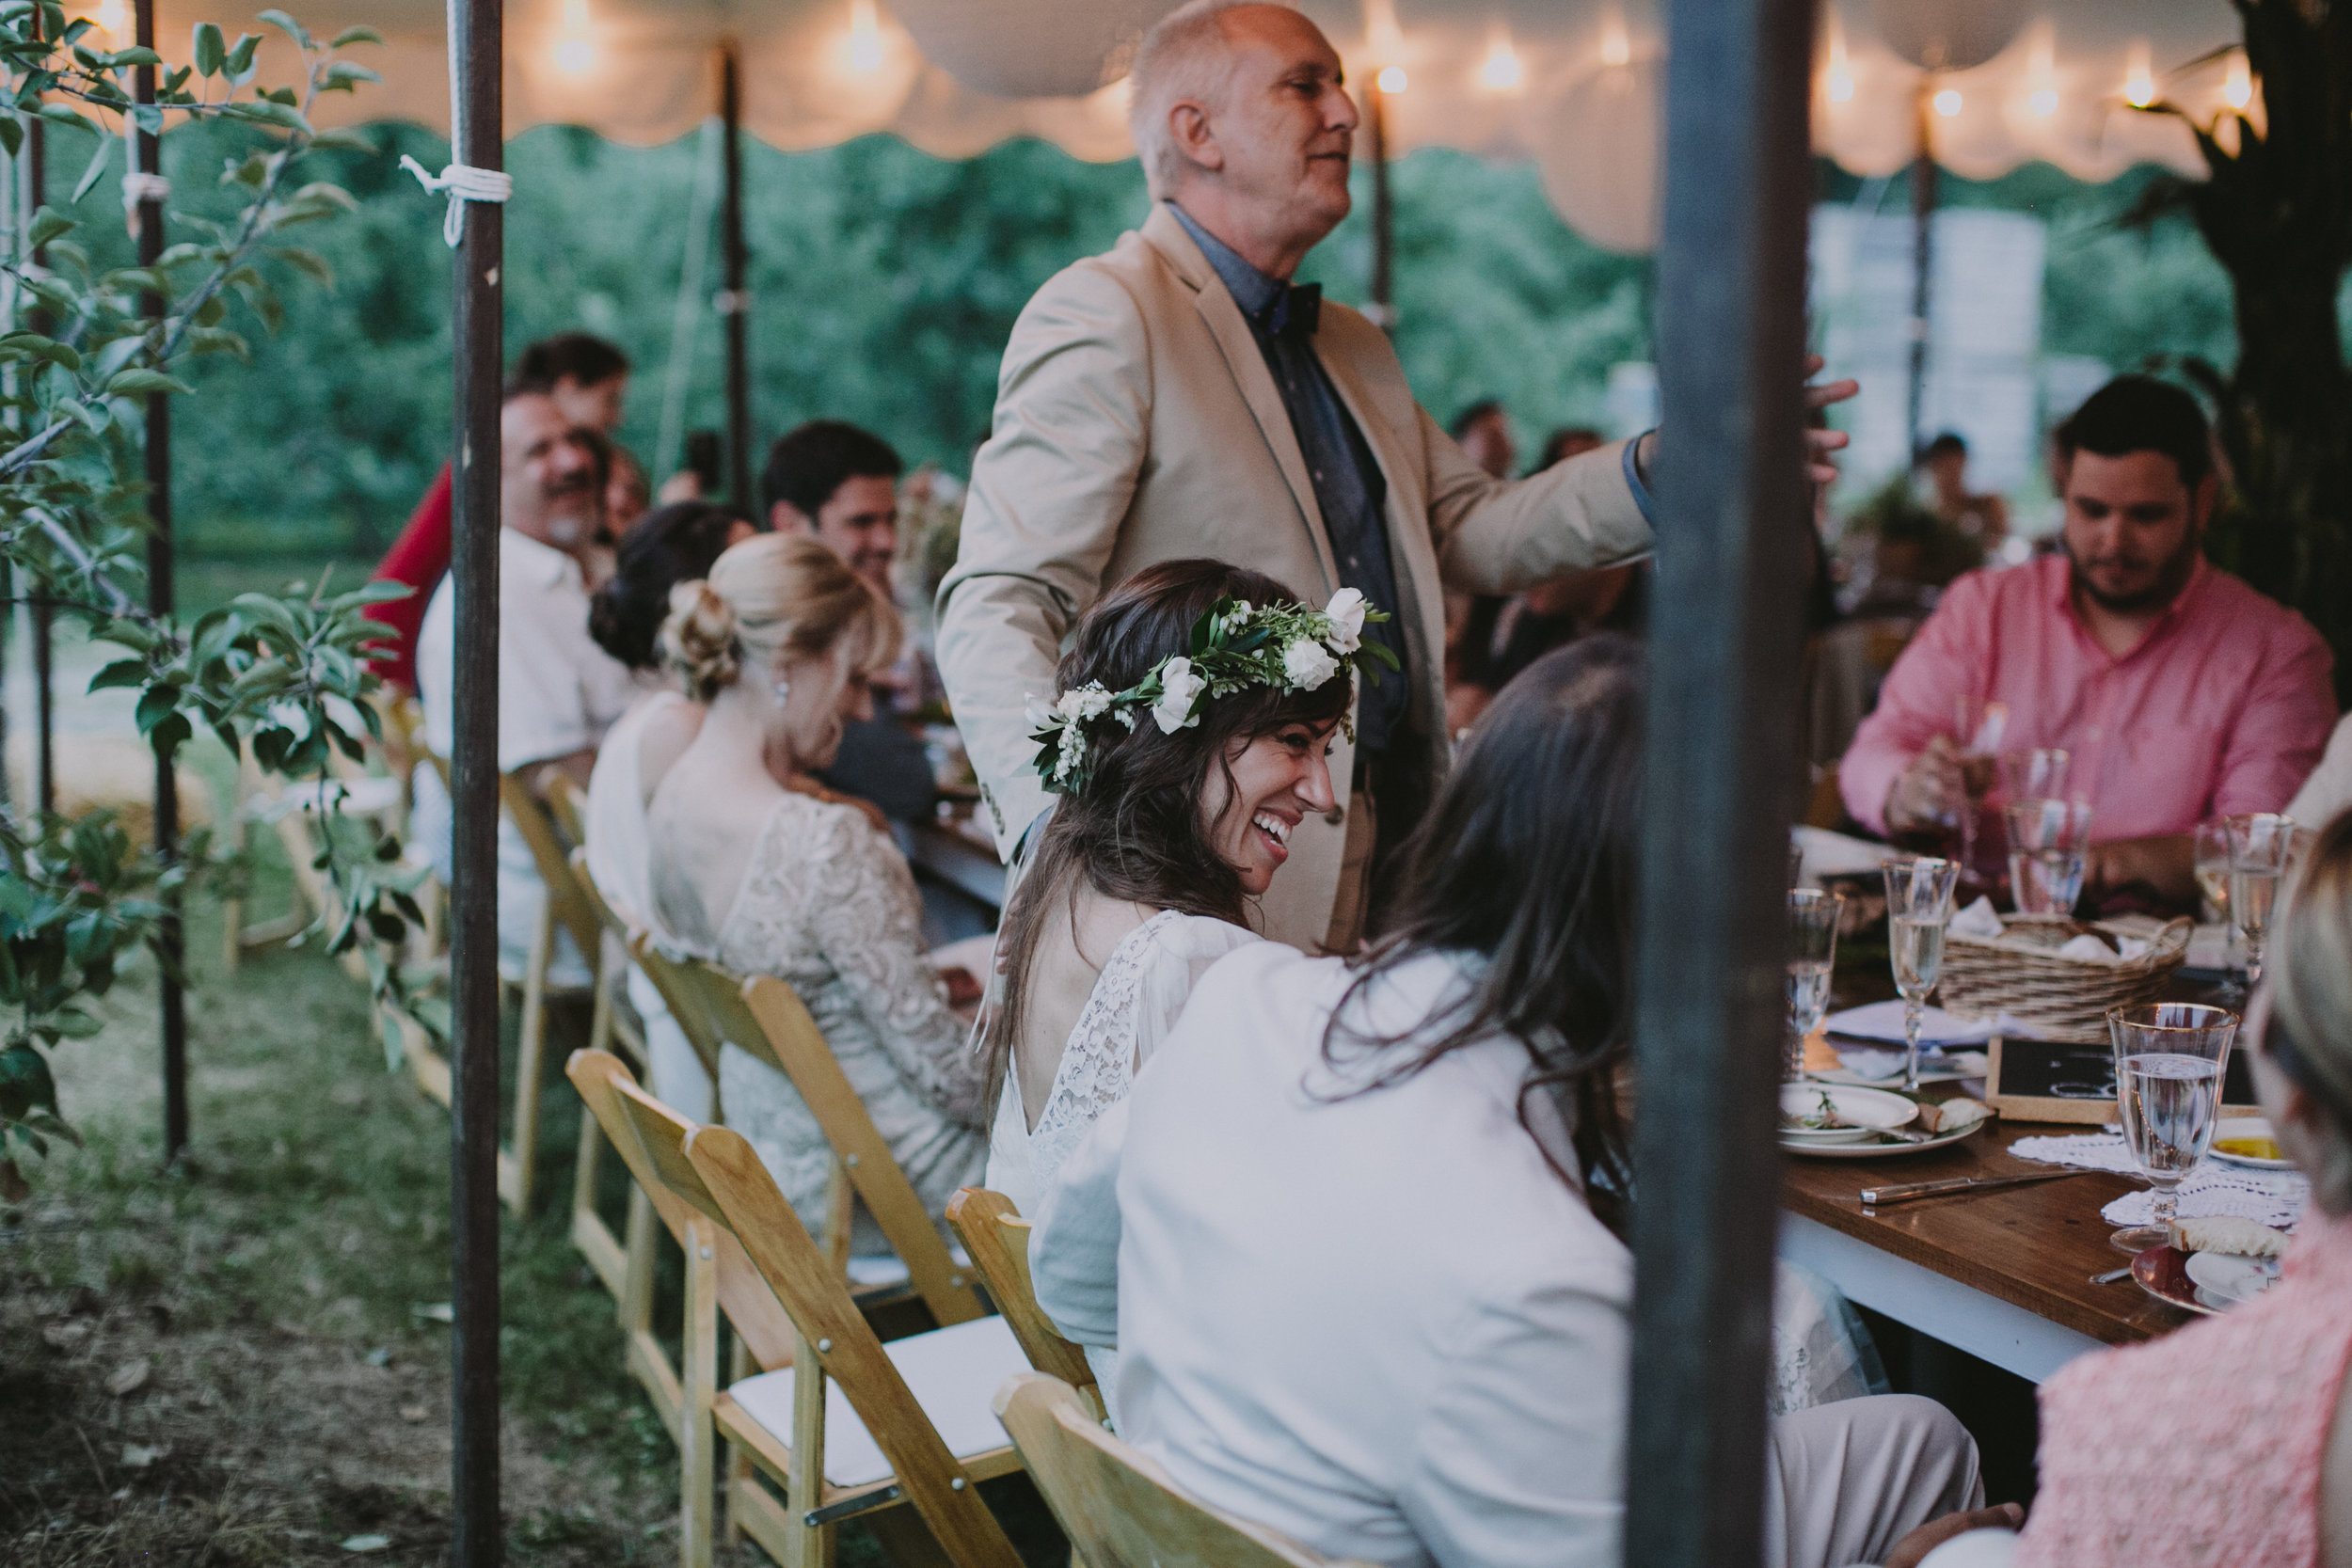 LIBERTY_VIEW_FARM_HIGHLAND_NY_WEDDING_CHELLISE_MICHAEL_PHOTOGRAPHY866.JPG